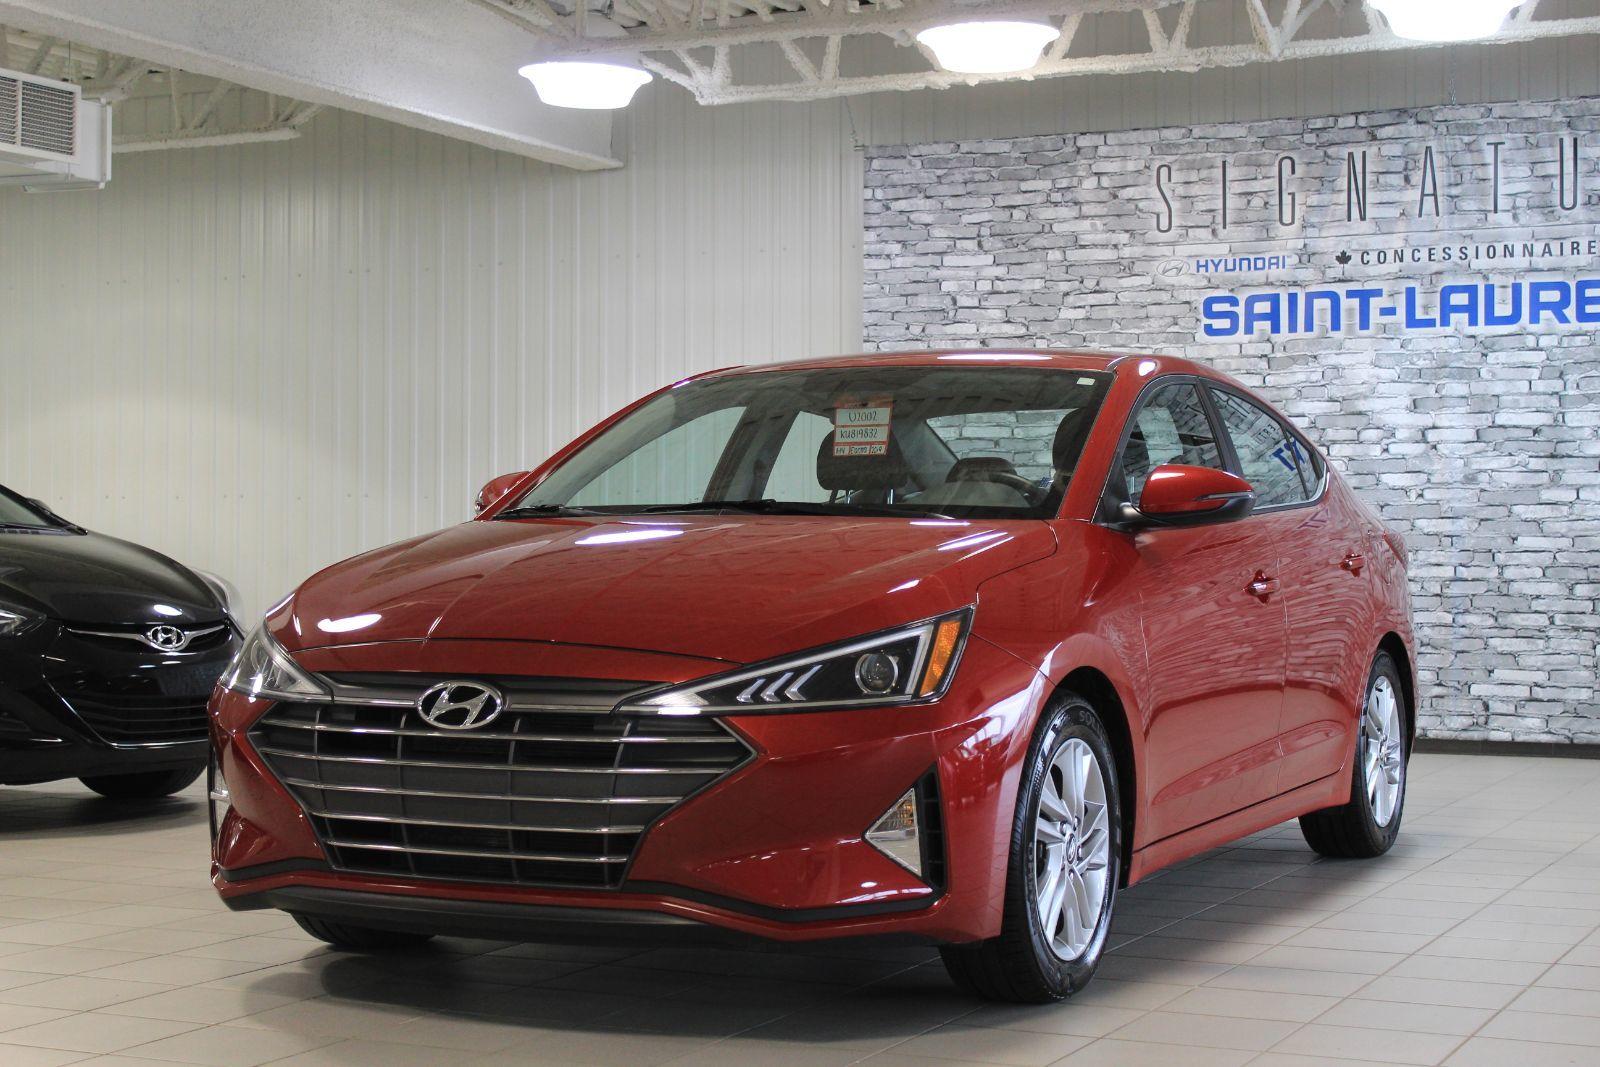 2019 Hyundai Elantra complet